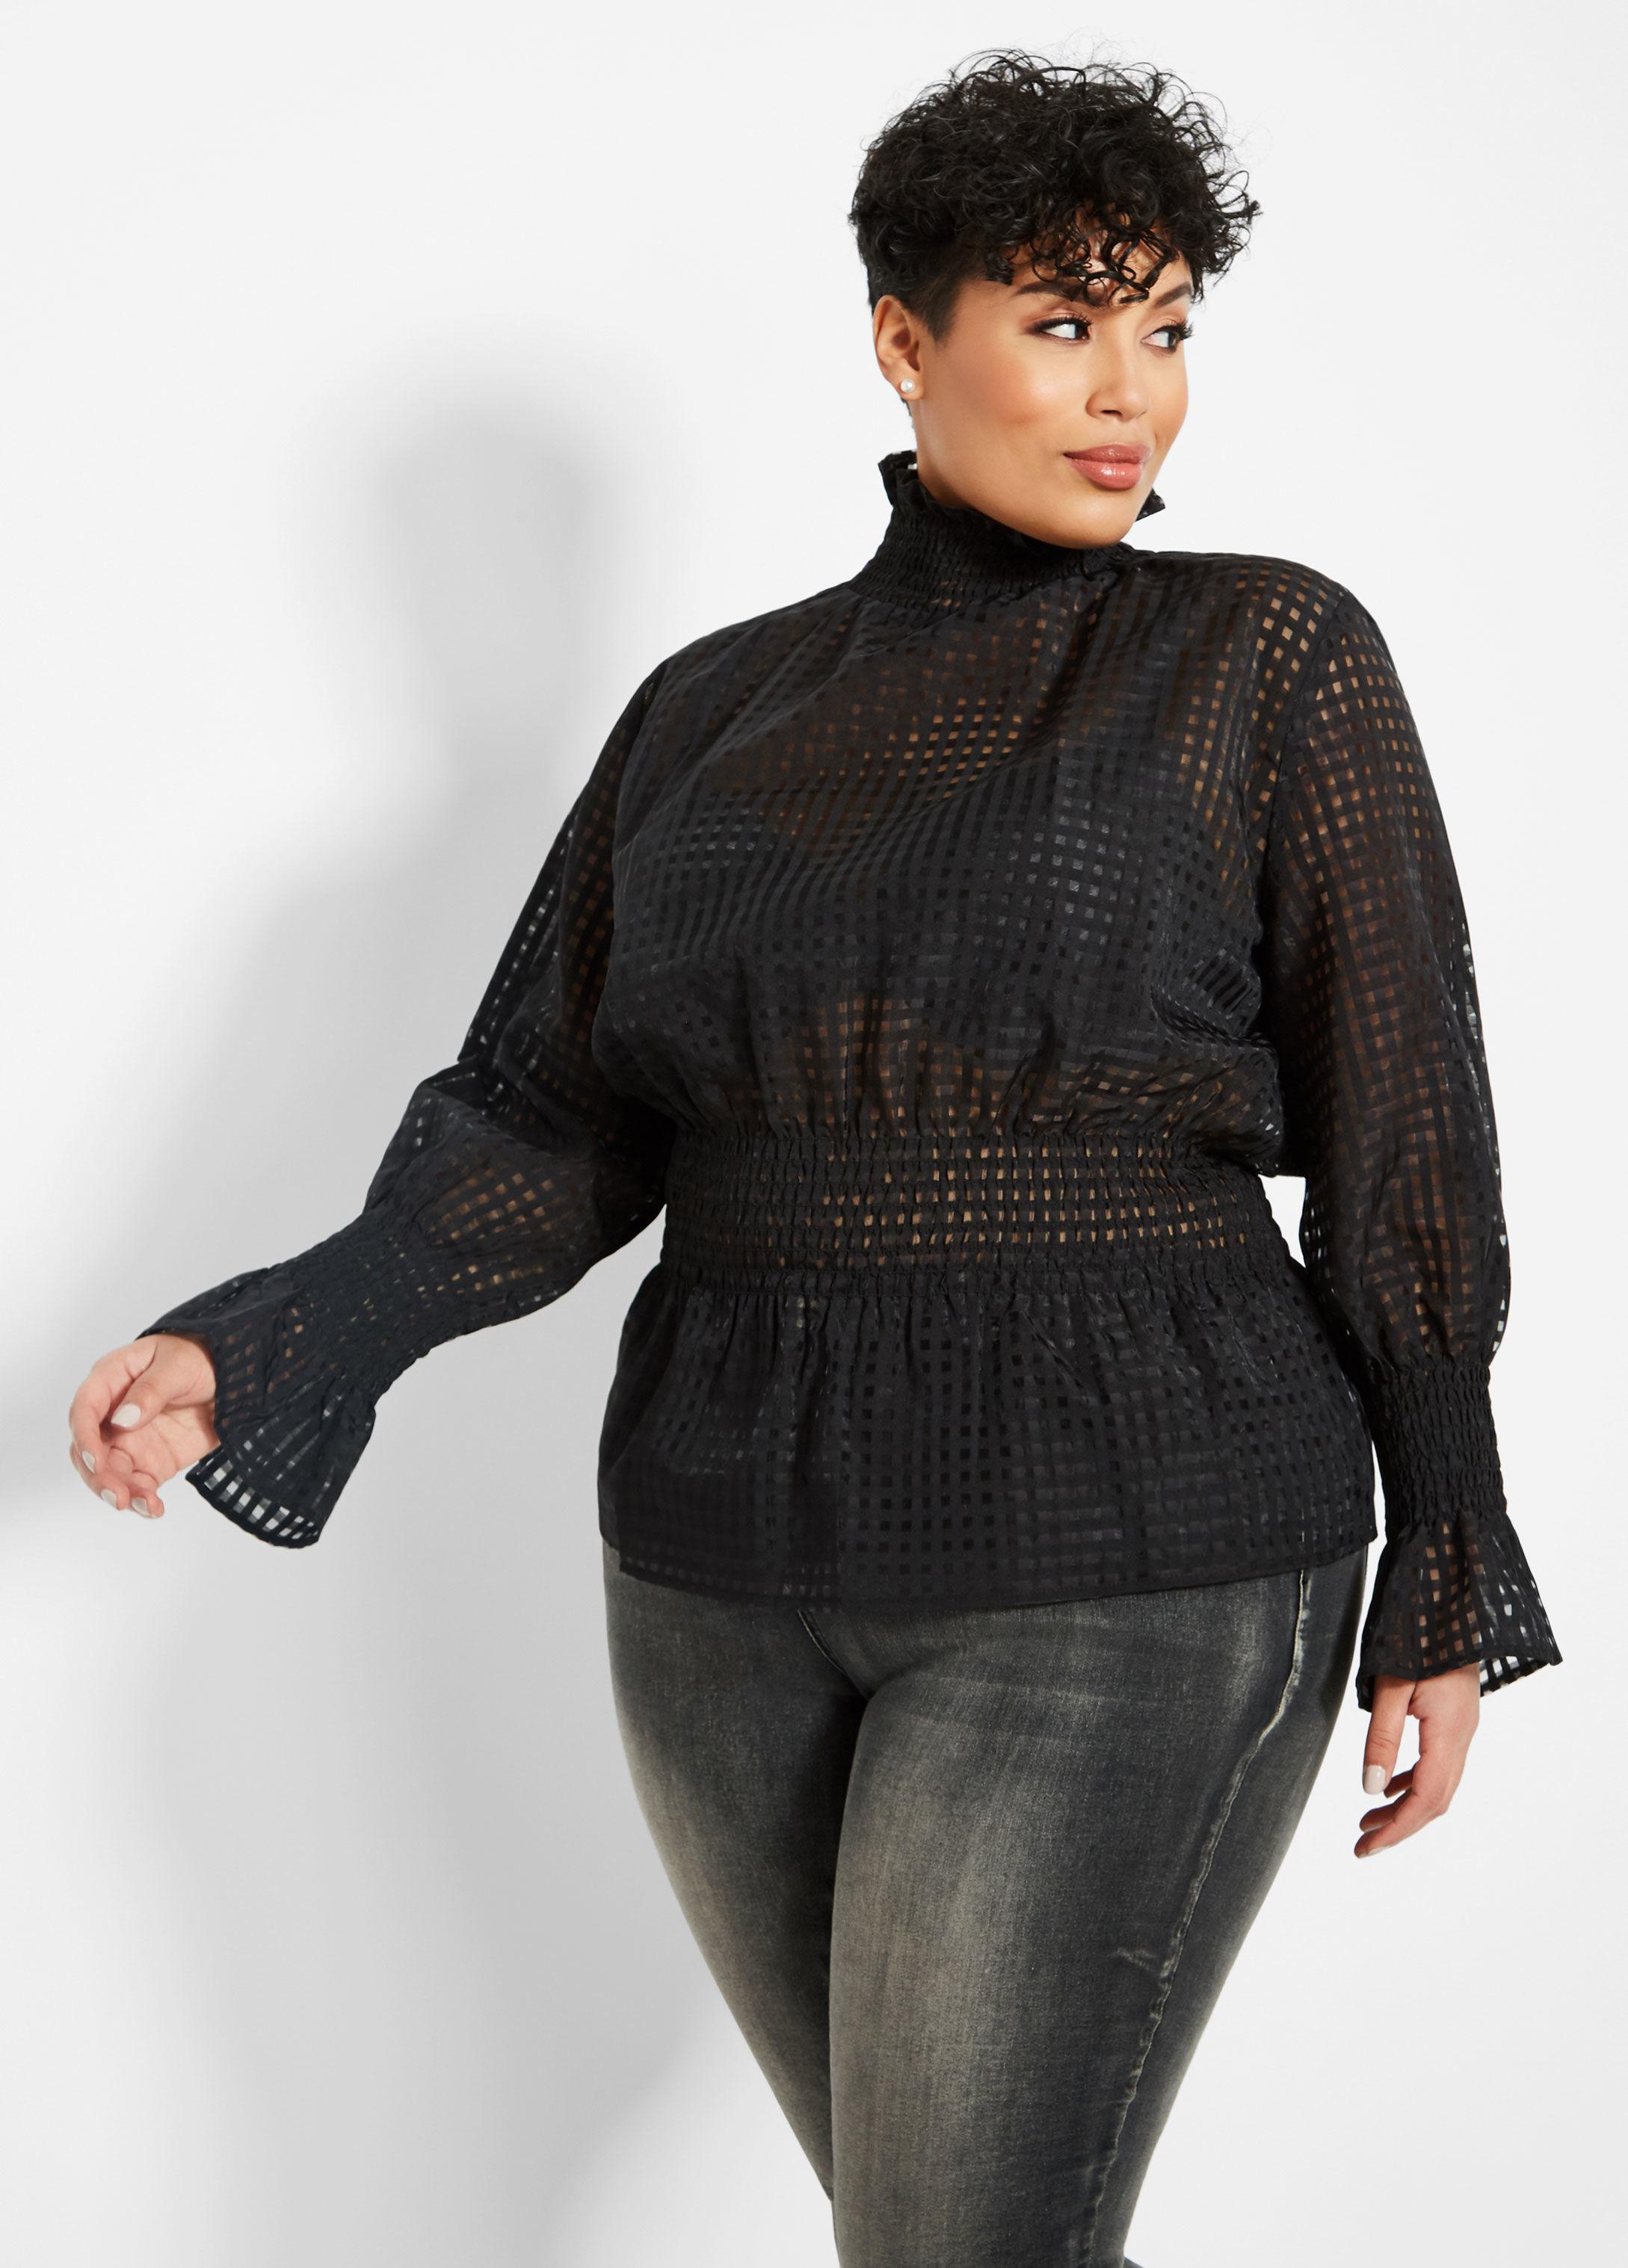 e7f855c67e6 Lyst - Ashley Stewart Plus Size Textured Smock Waist Top in Black